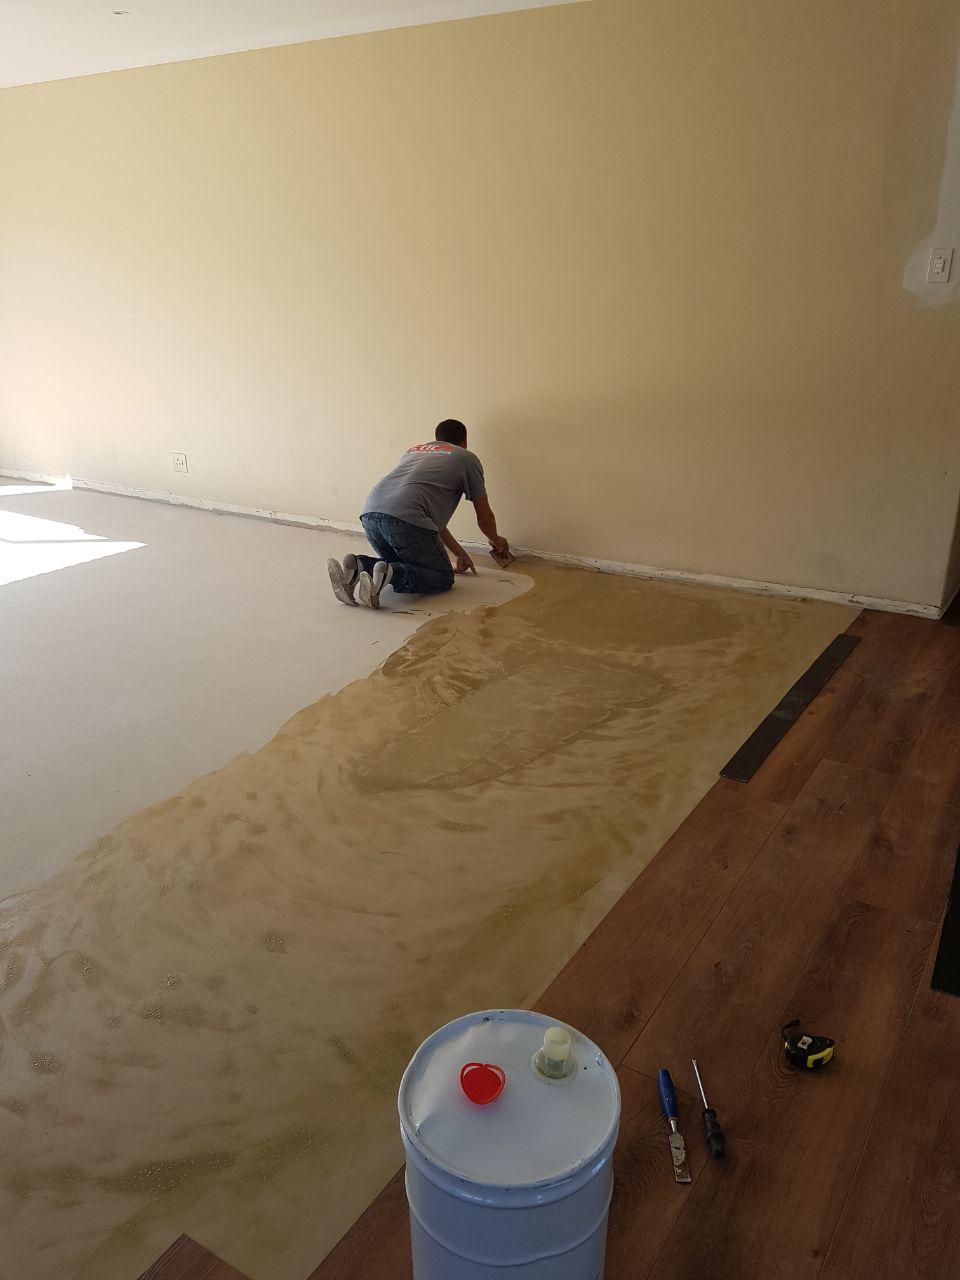 The Importance Of A Smooth Floor Prior To Gluing Down Vinyl TLC - Preparing floor for vinyl plank flooring